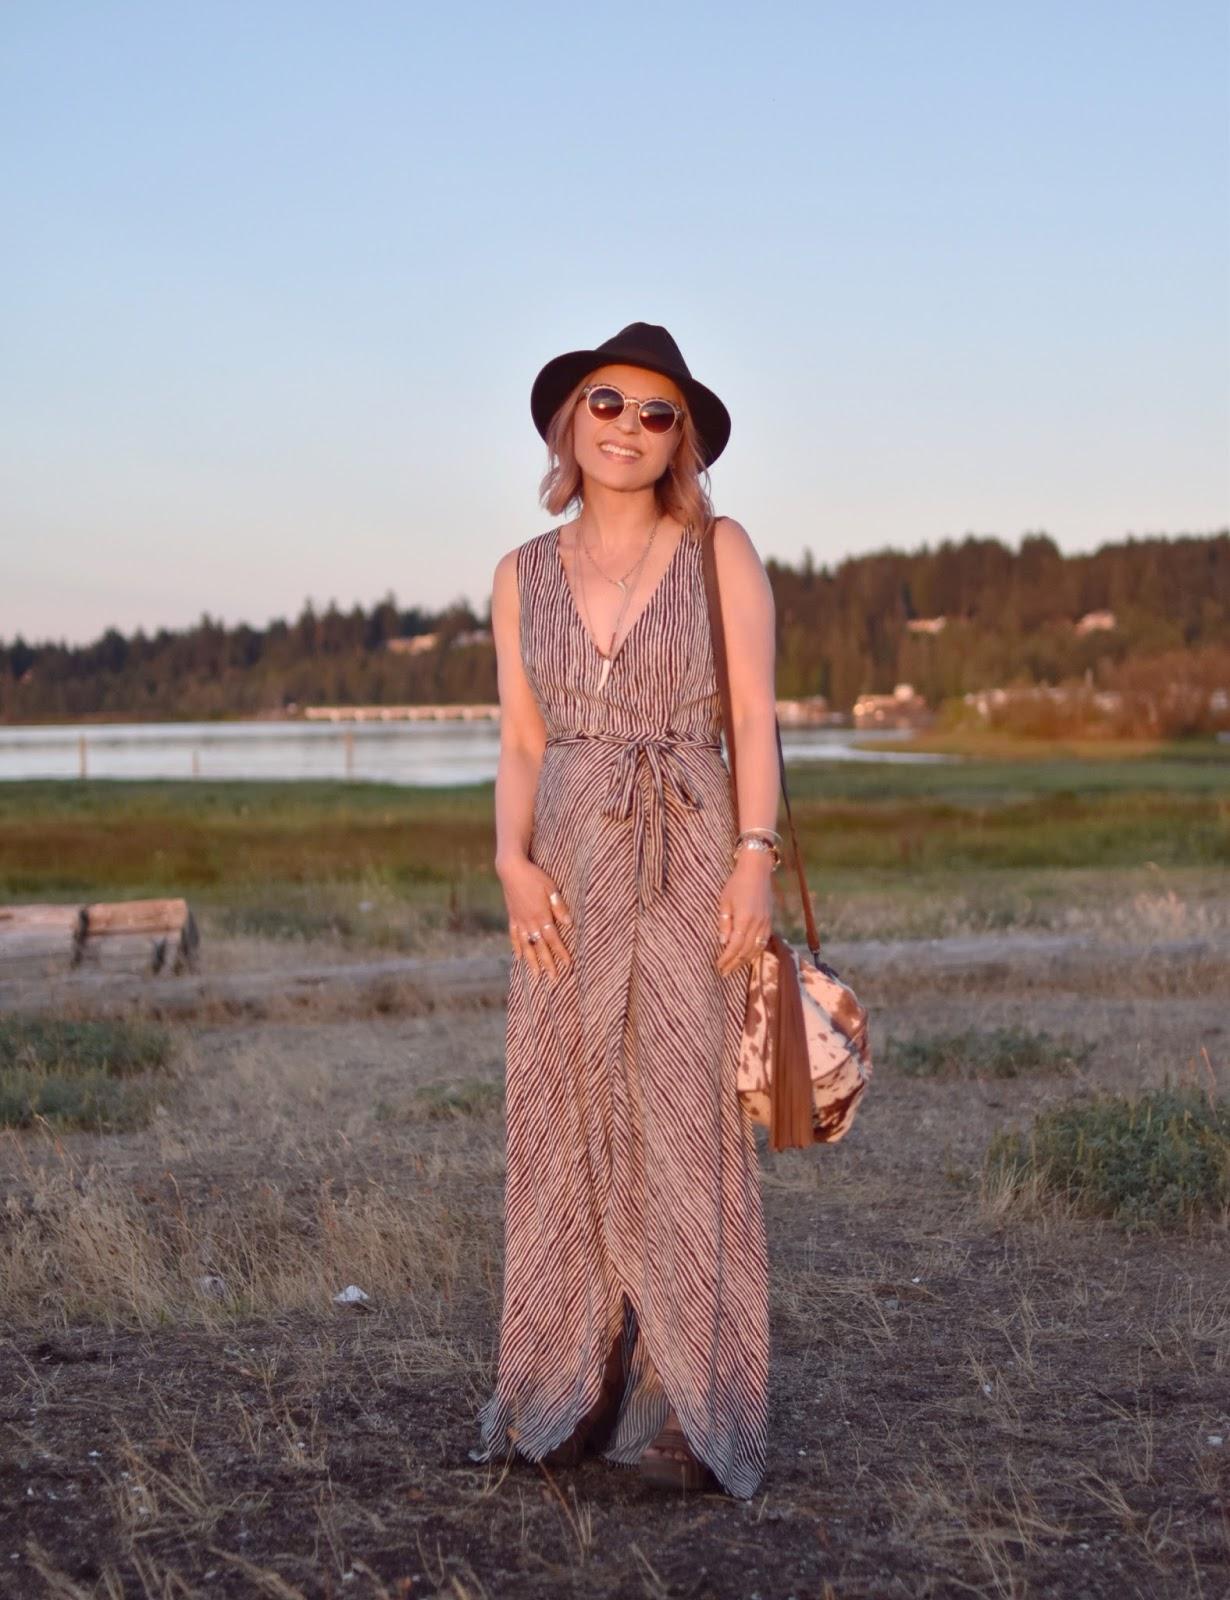 Monika Faulkner personal style inspiration - black and white striped maxi-dress, brown felt fedora, animal-patterned sunglasses, pony-hair bag